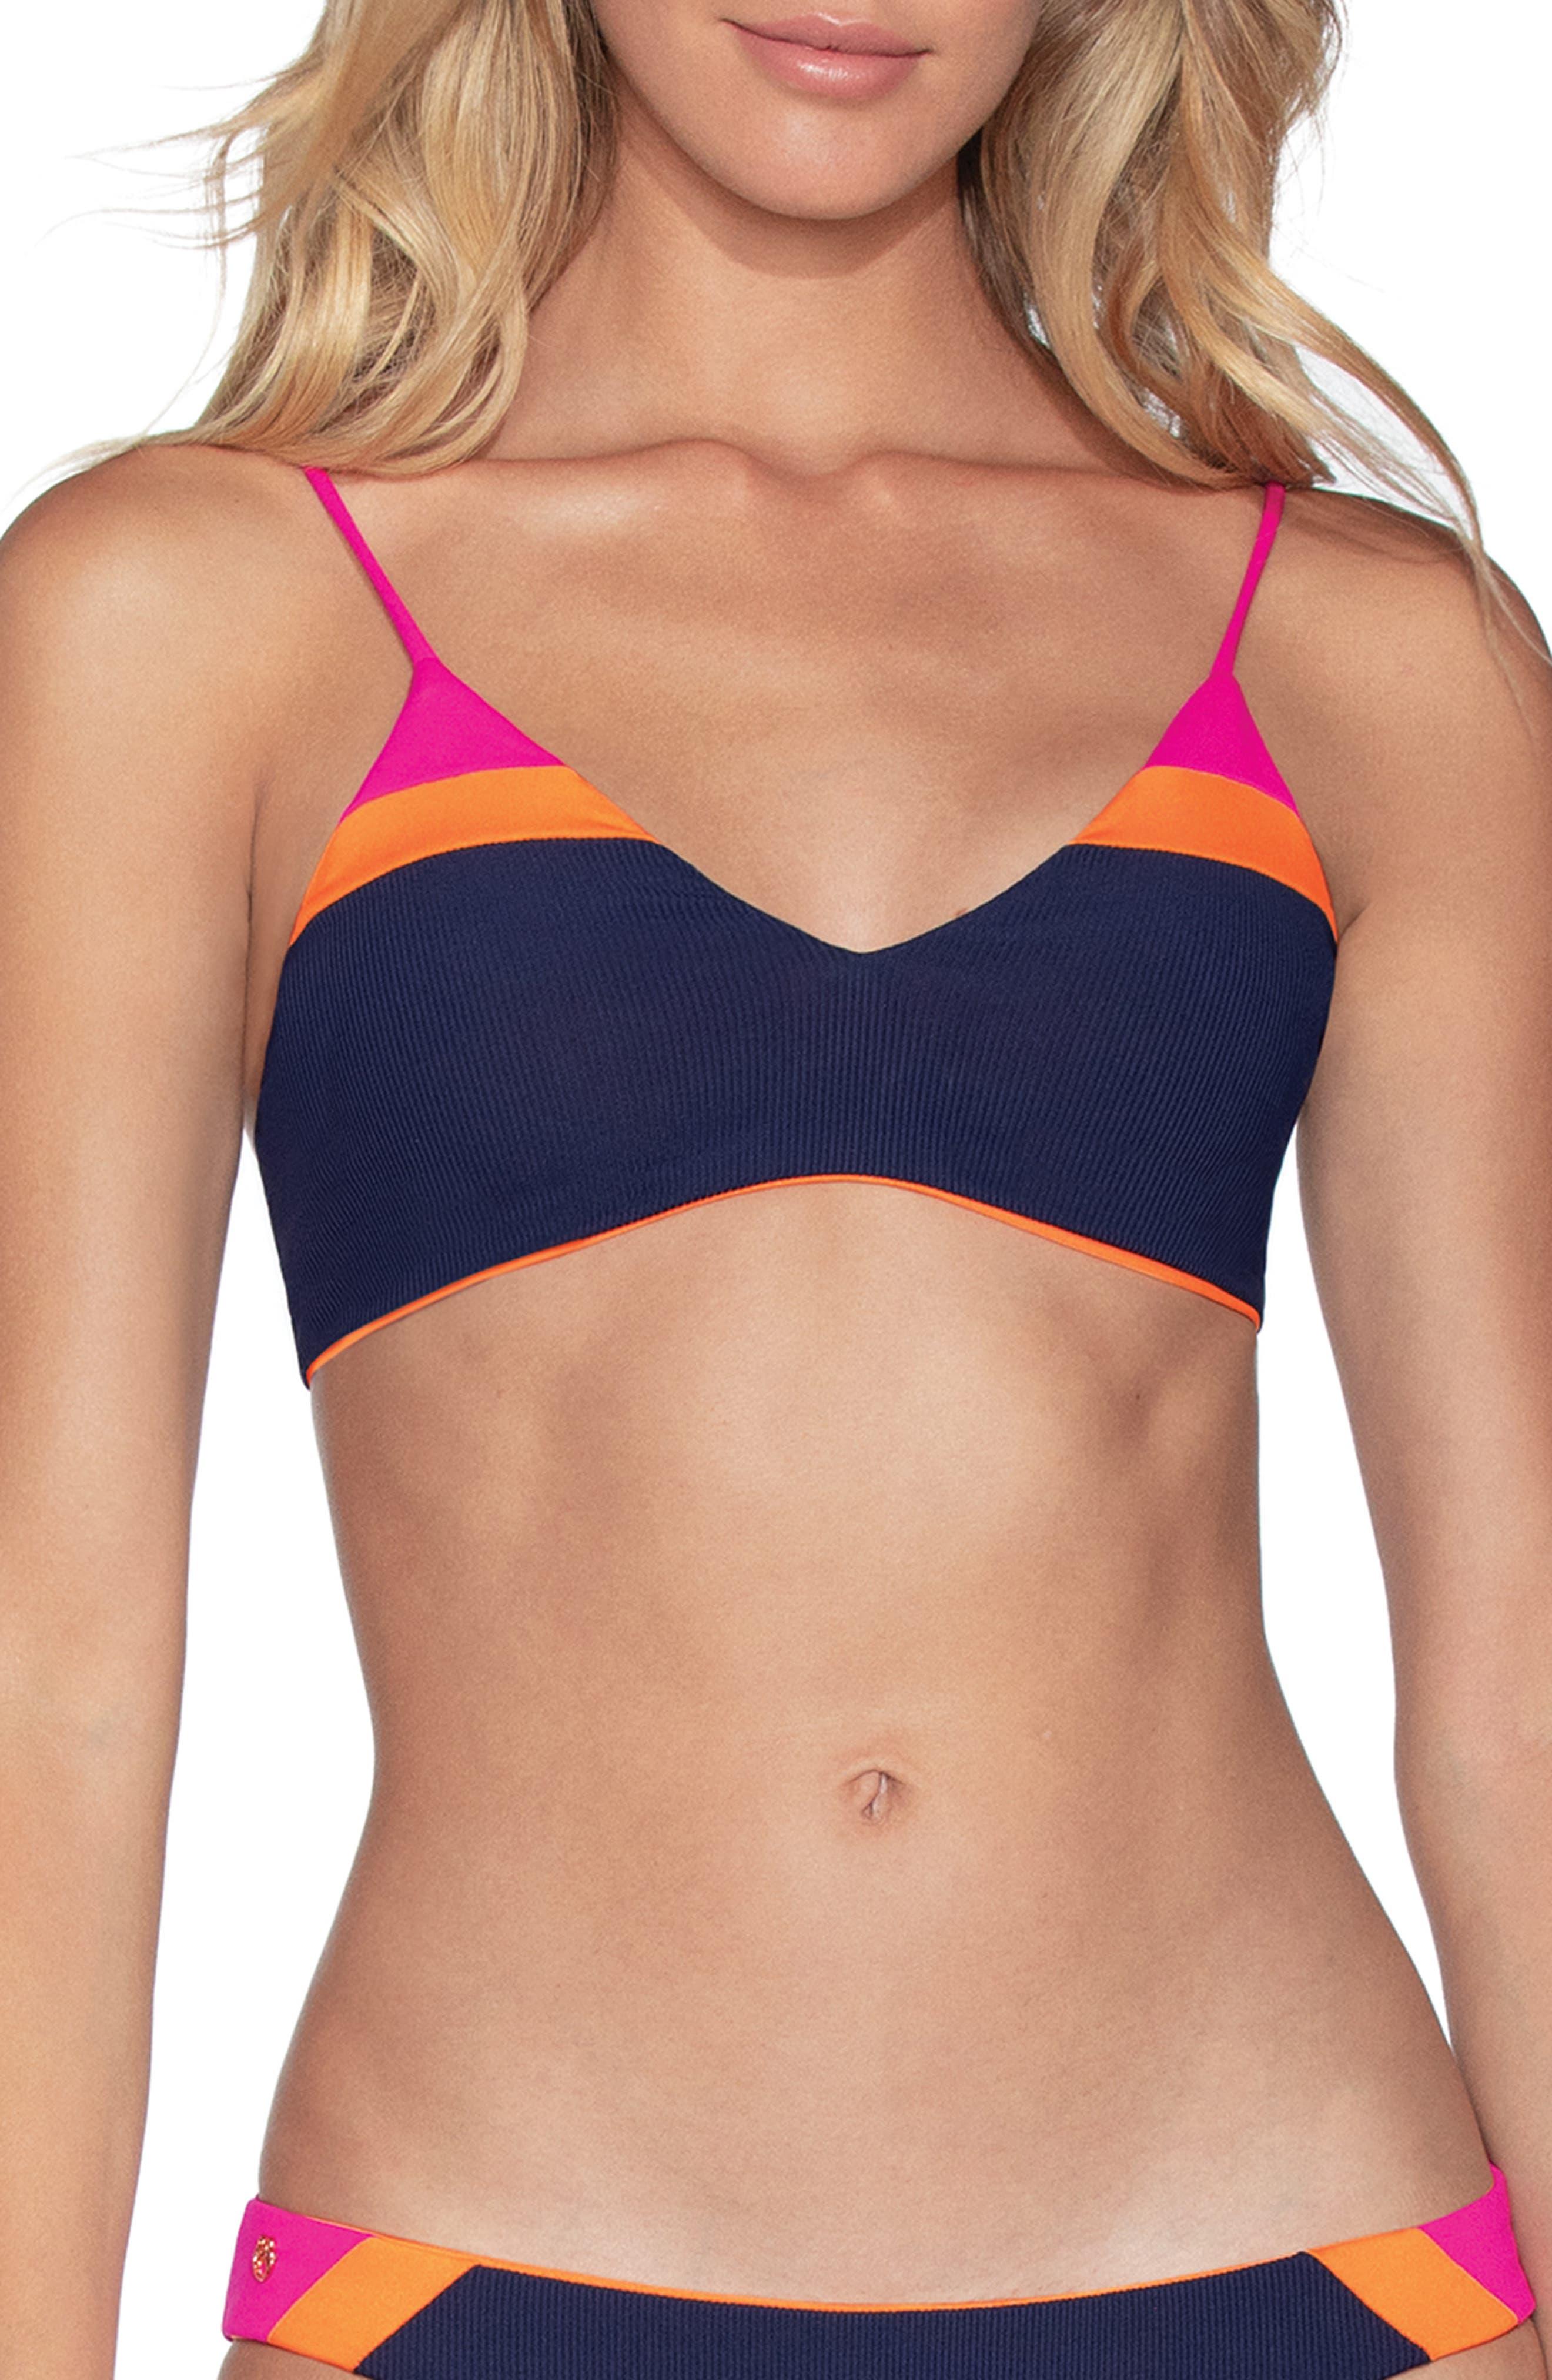 Maaji Womens Rocks Bralette Reversible Bikini Top Swimsuit Bikini Top